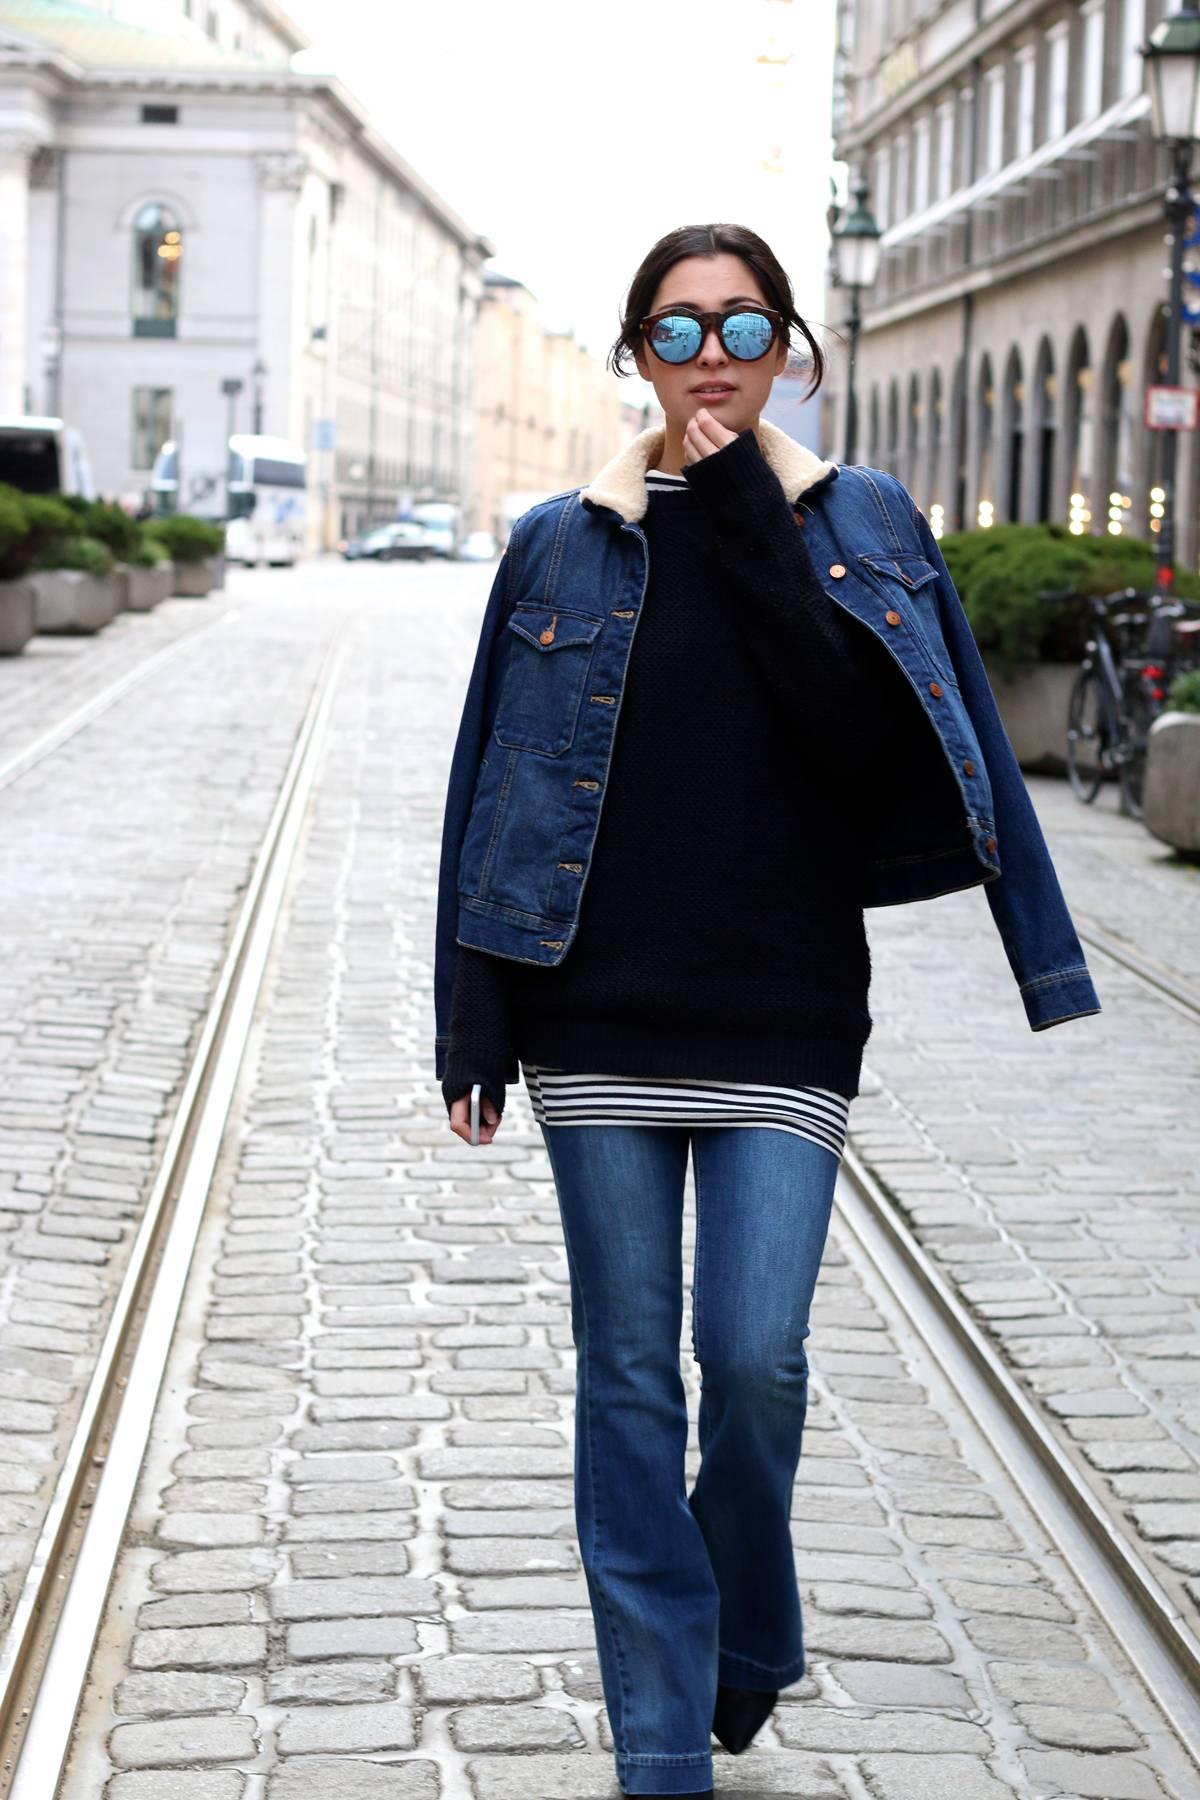 streetstyle - munich - inspiration - german fashionblog - fashionista - style - flared pants - schlaghose - denim trend - denim jacket - buffalo heels - le specs sunnies - ootd - lookbook - marienplatz - boyfriend sweater